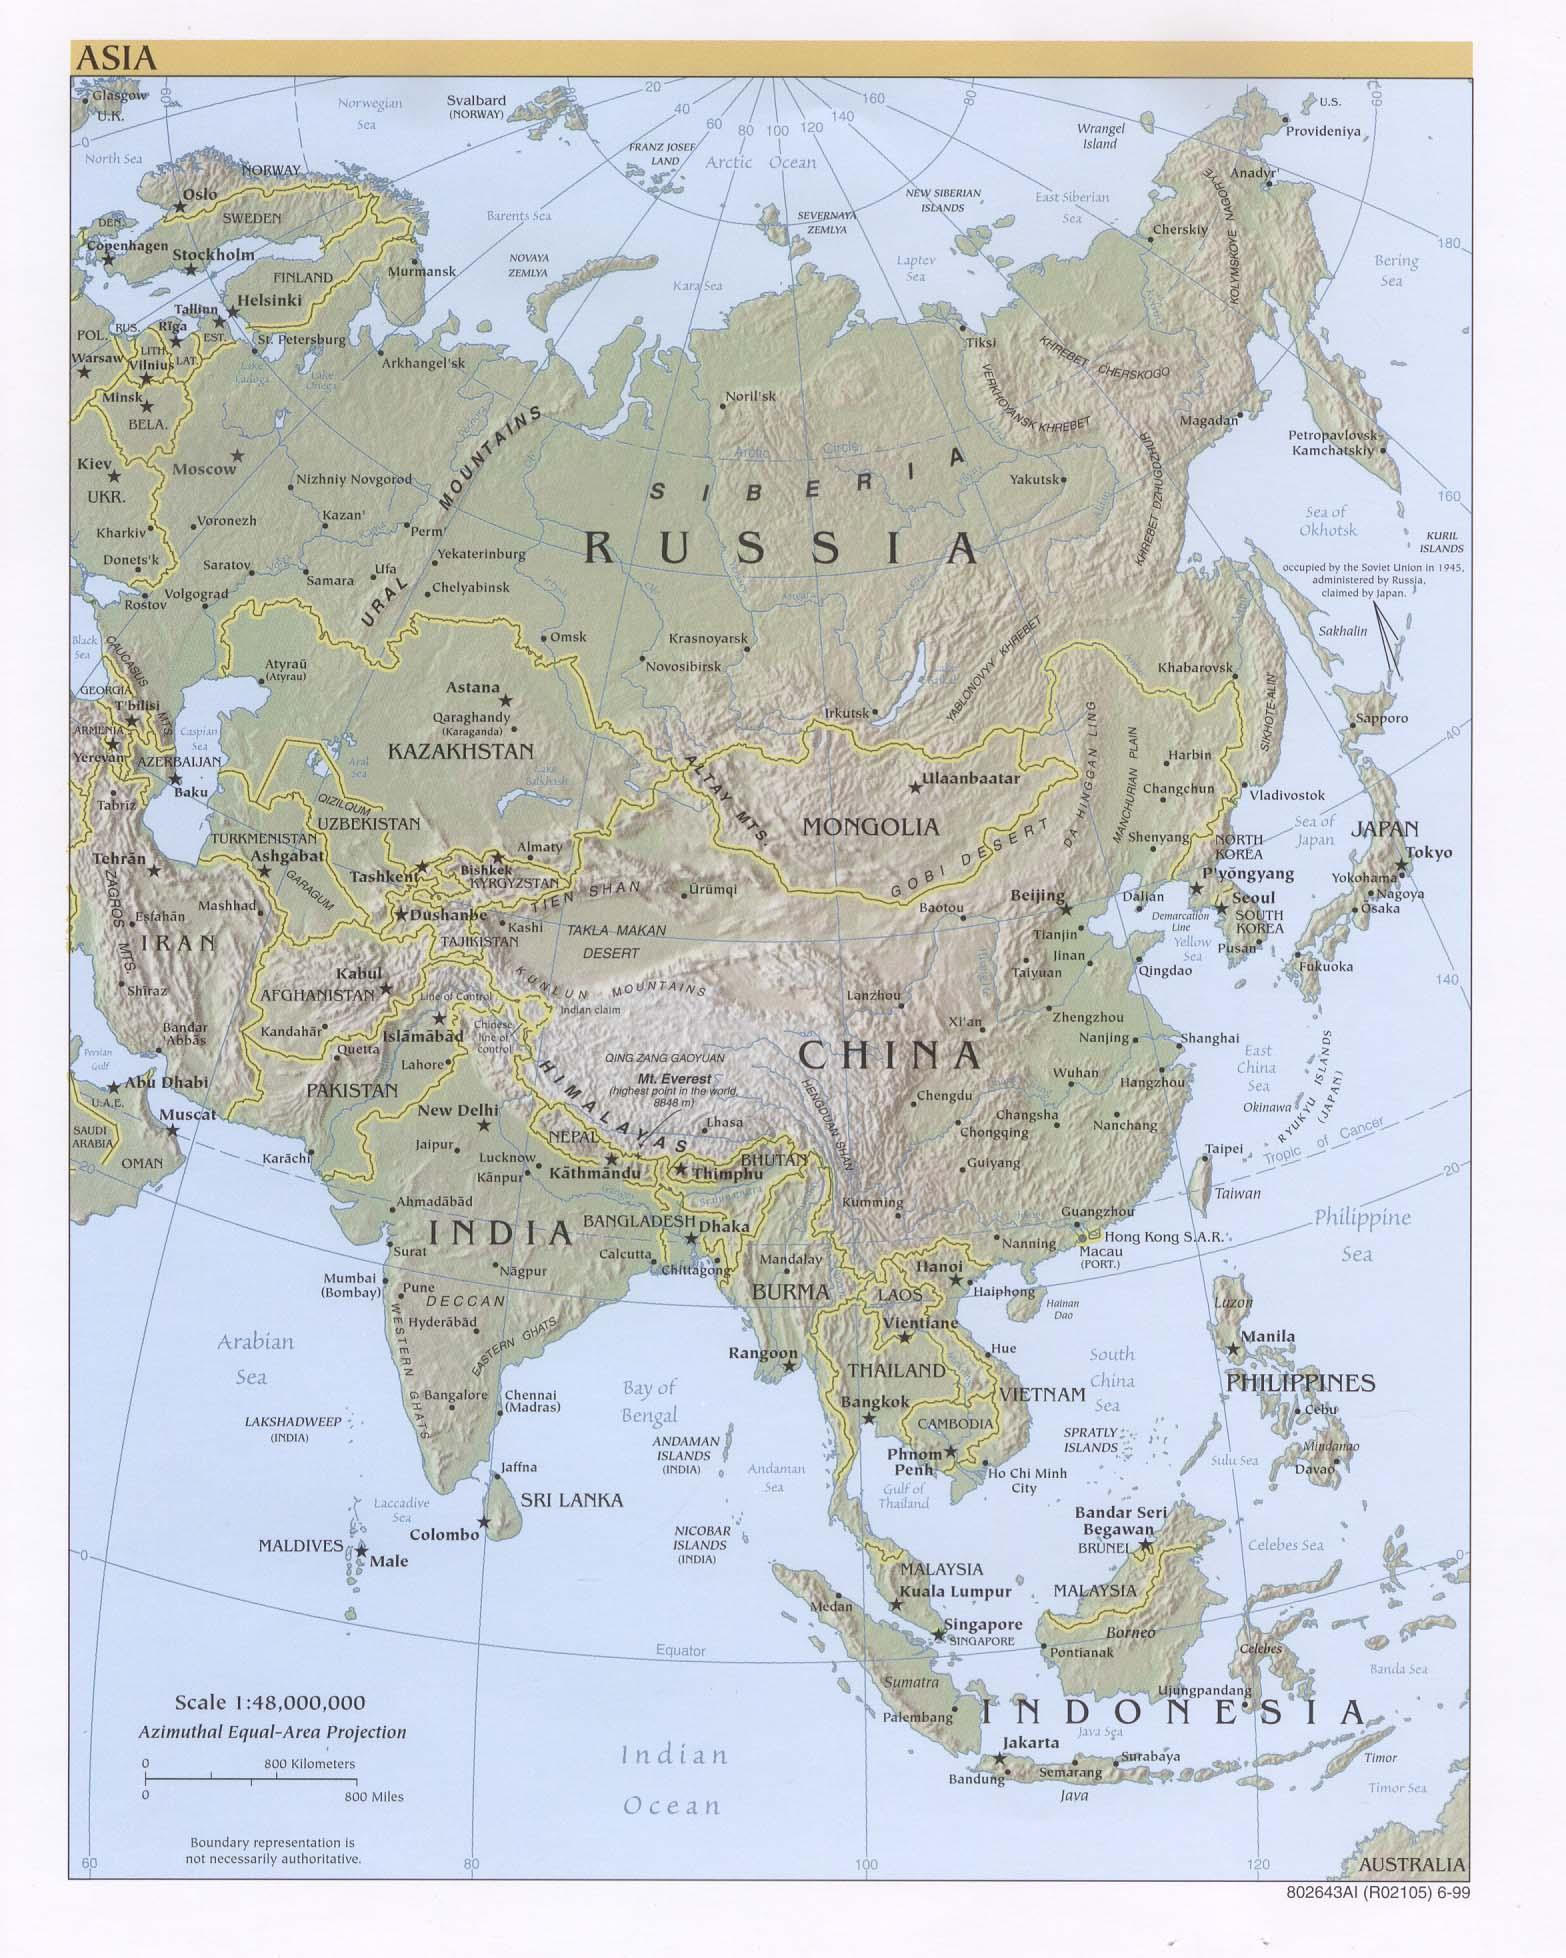 Mapa Físico de Asia 1999